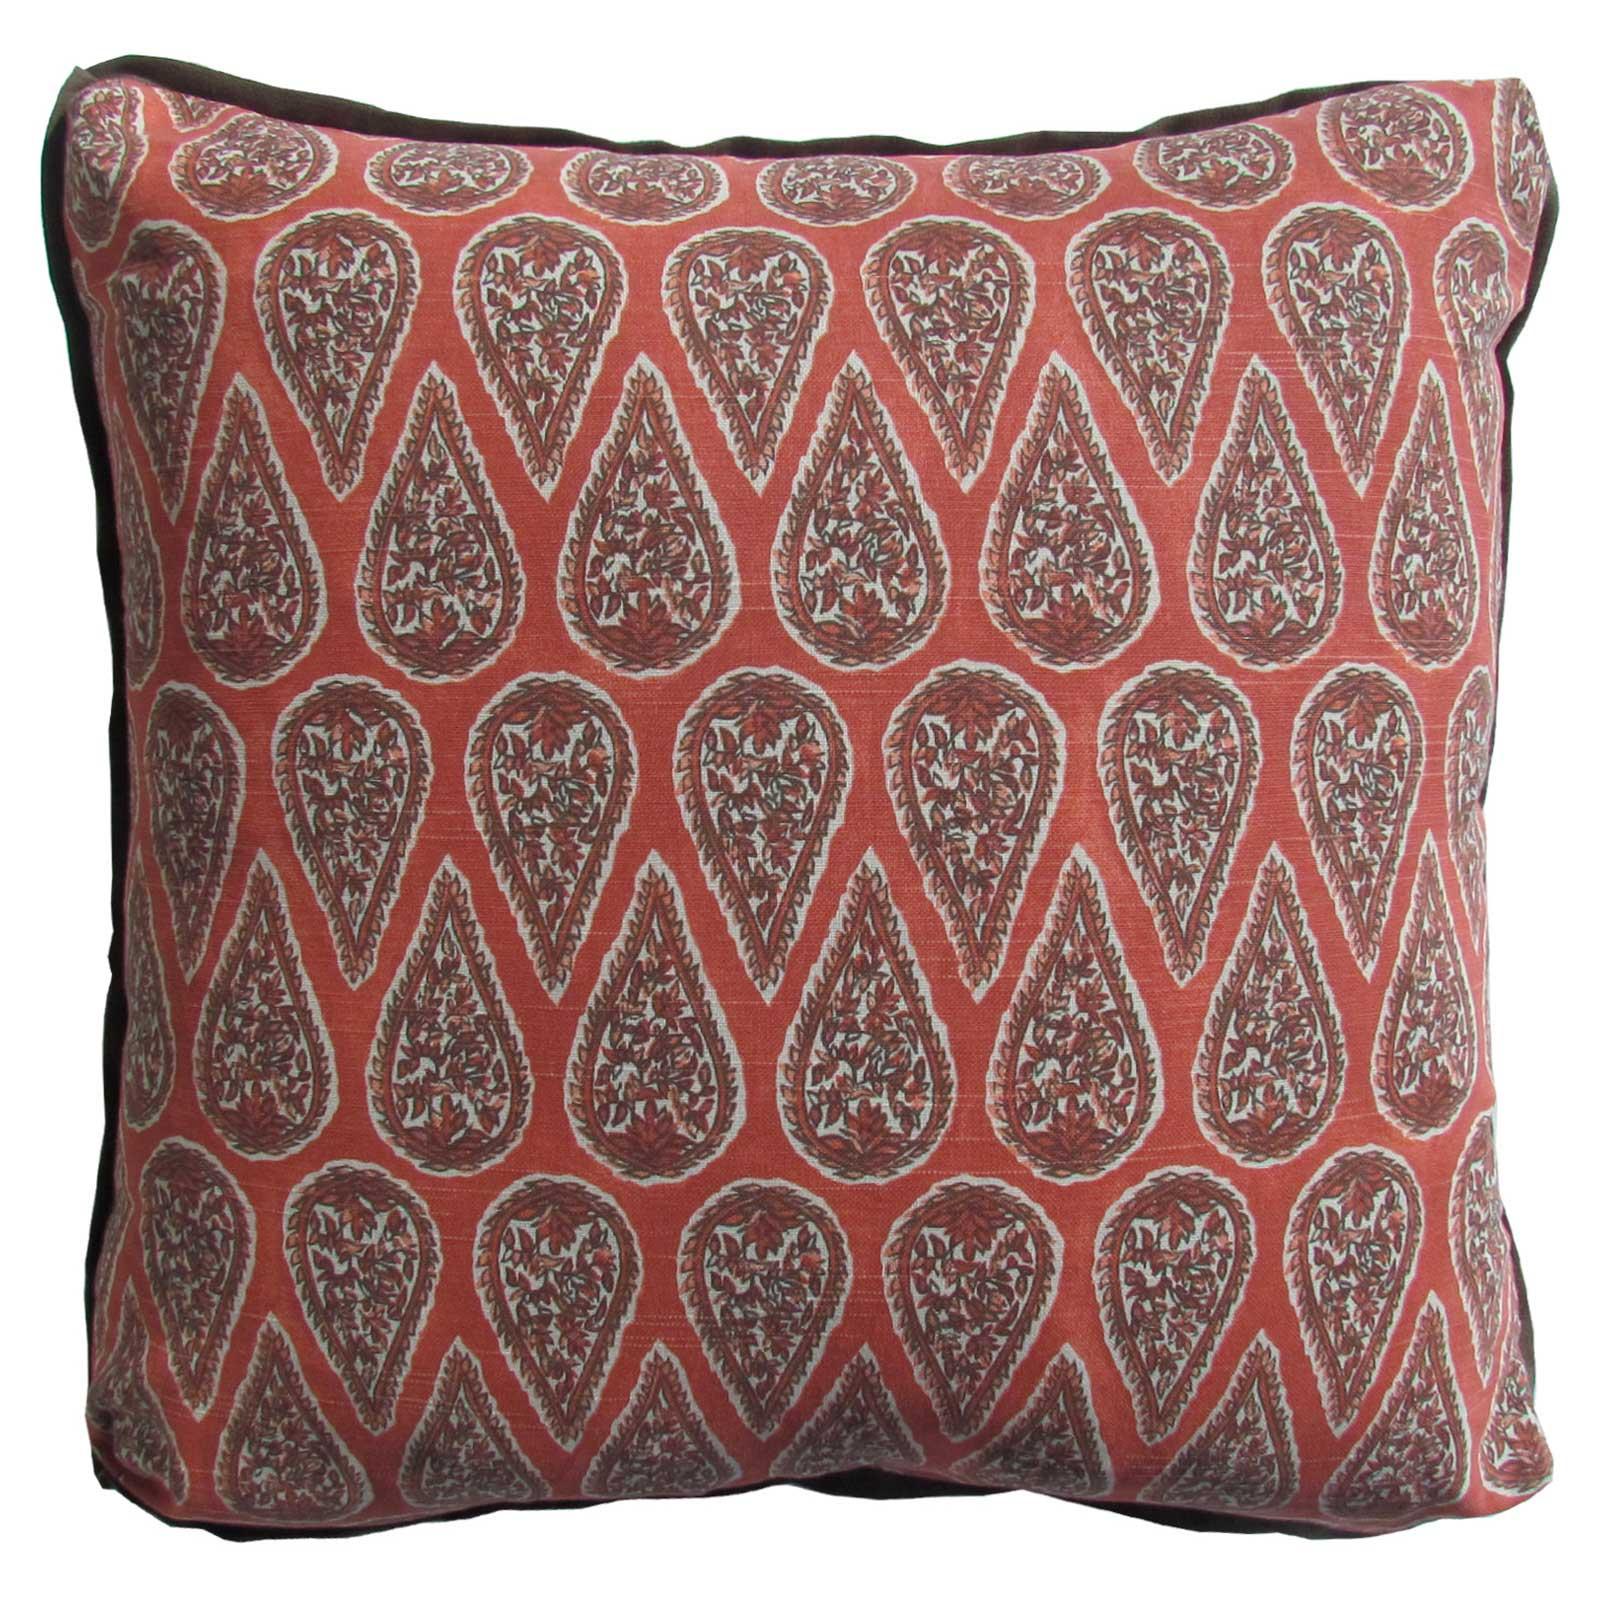 Eleni Global Bazaar Red Paisley Block Pillow - 24x24